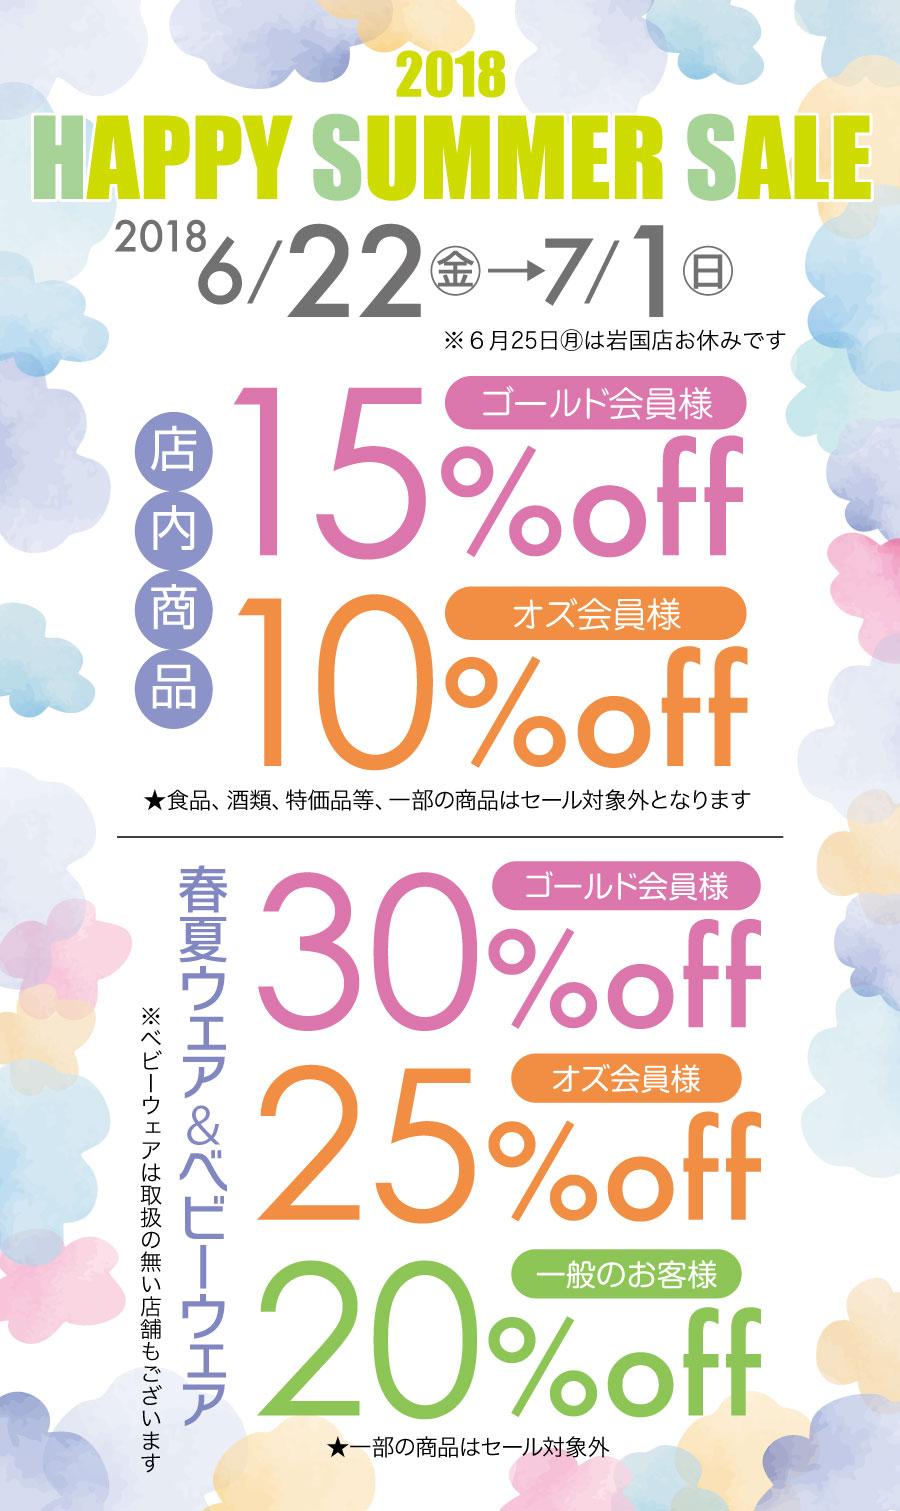 2018 Happy Summer Sale夏本番より一足早く開催中!